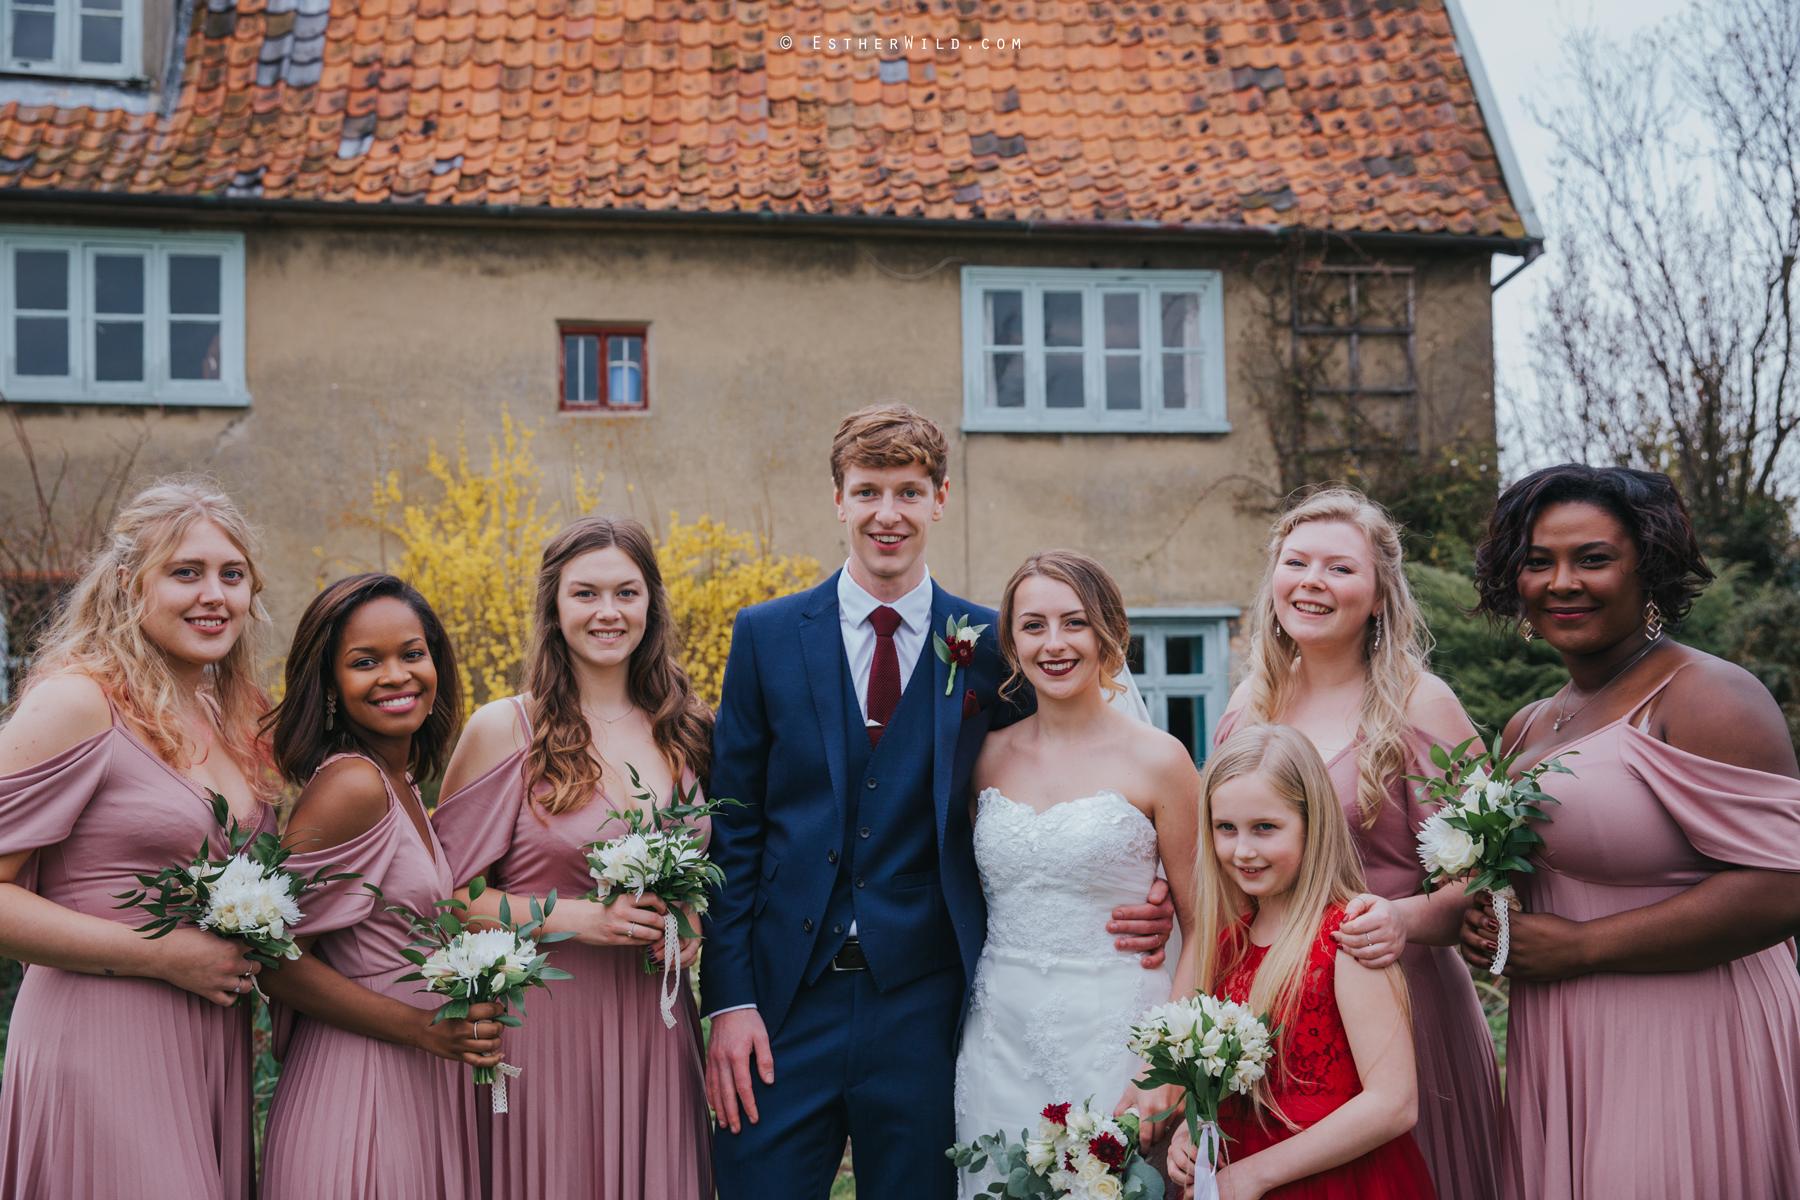 Glebe_Farm_Barn_Rustic_Norfolk_Wedding_Esther_Wild_Photographer_Copyright_IMG_1954.jpg